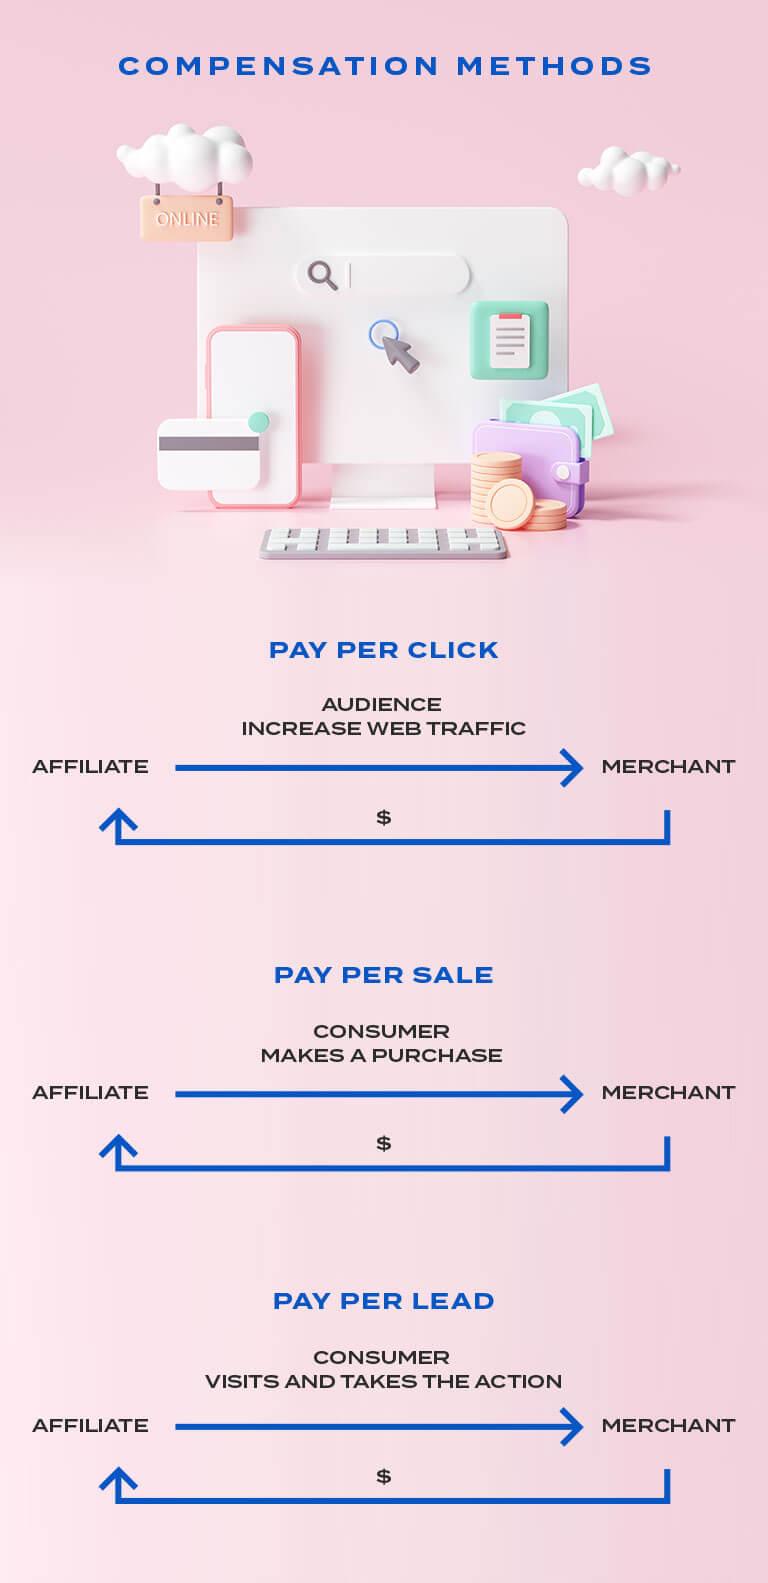 affiliate marketing compensation methods